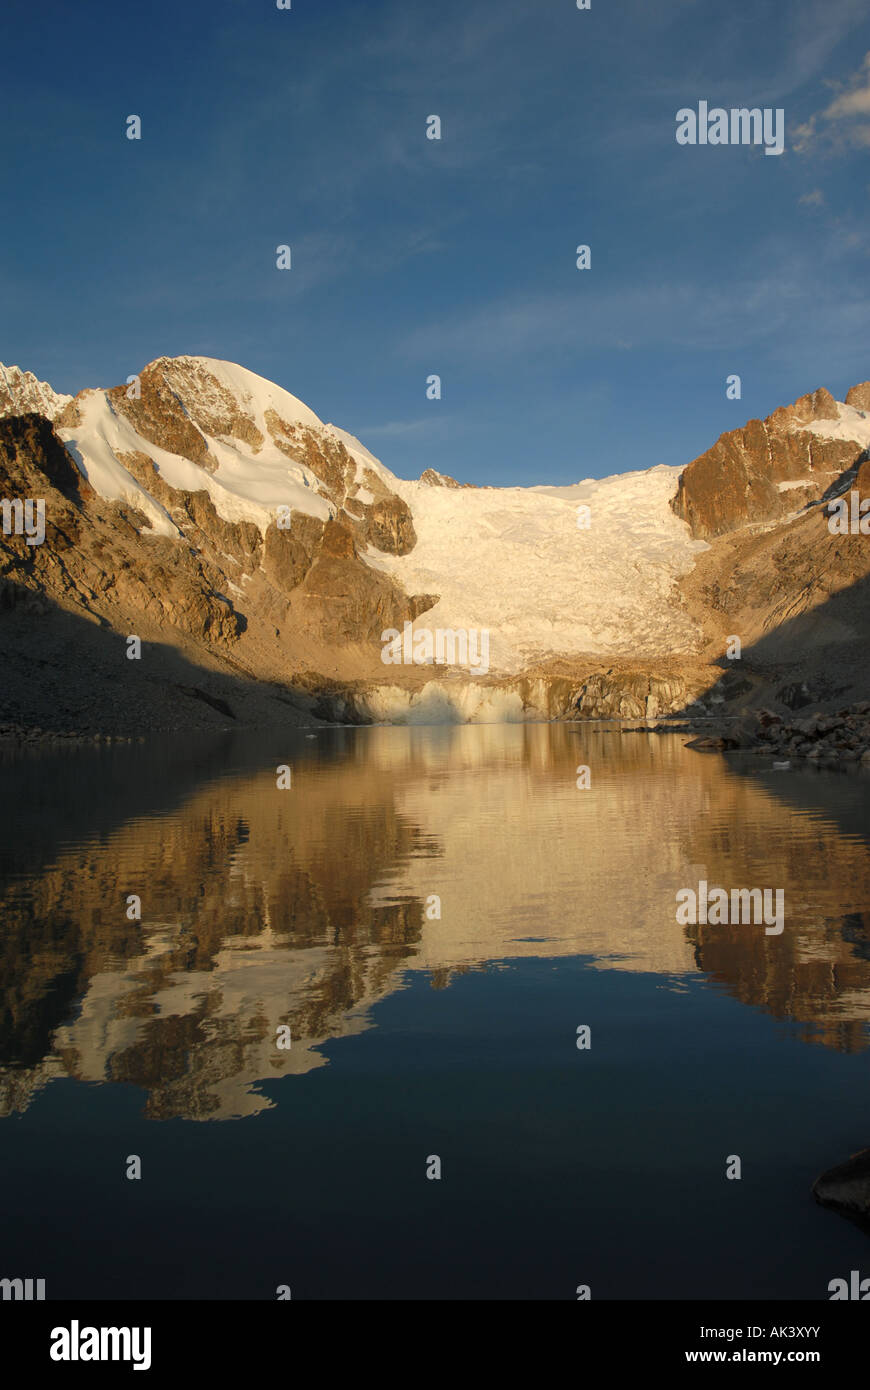 The Lagunas Glaciar is located below Mount Illampu at 5 038 meters outside of Sorata Bolivia South America - Stock Image